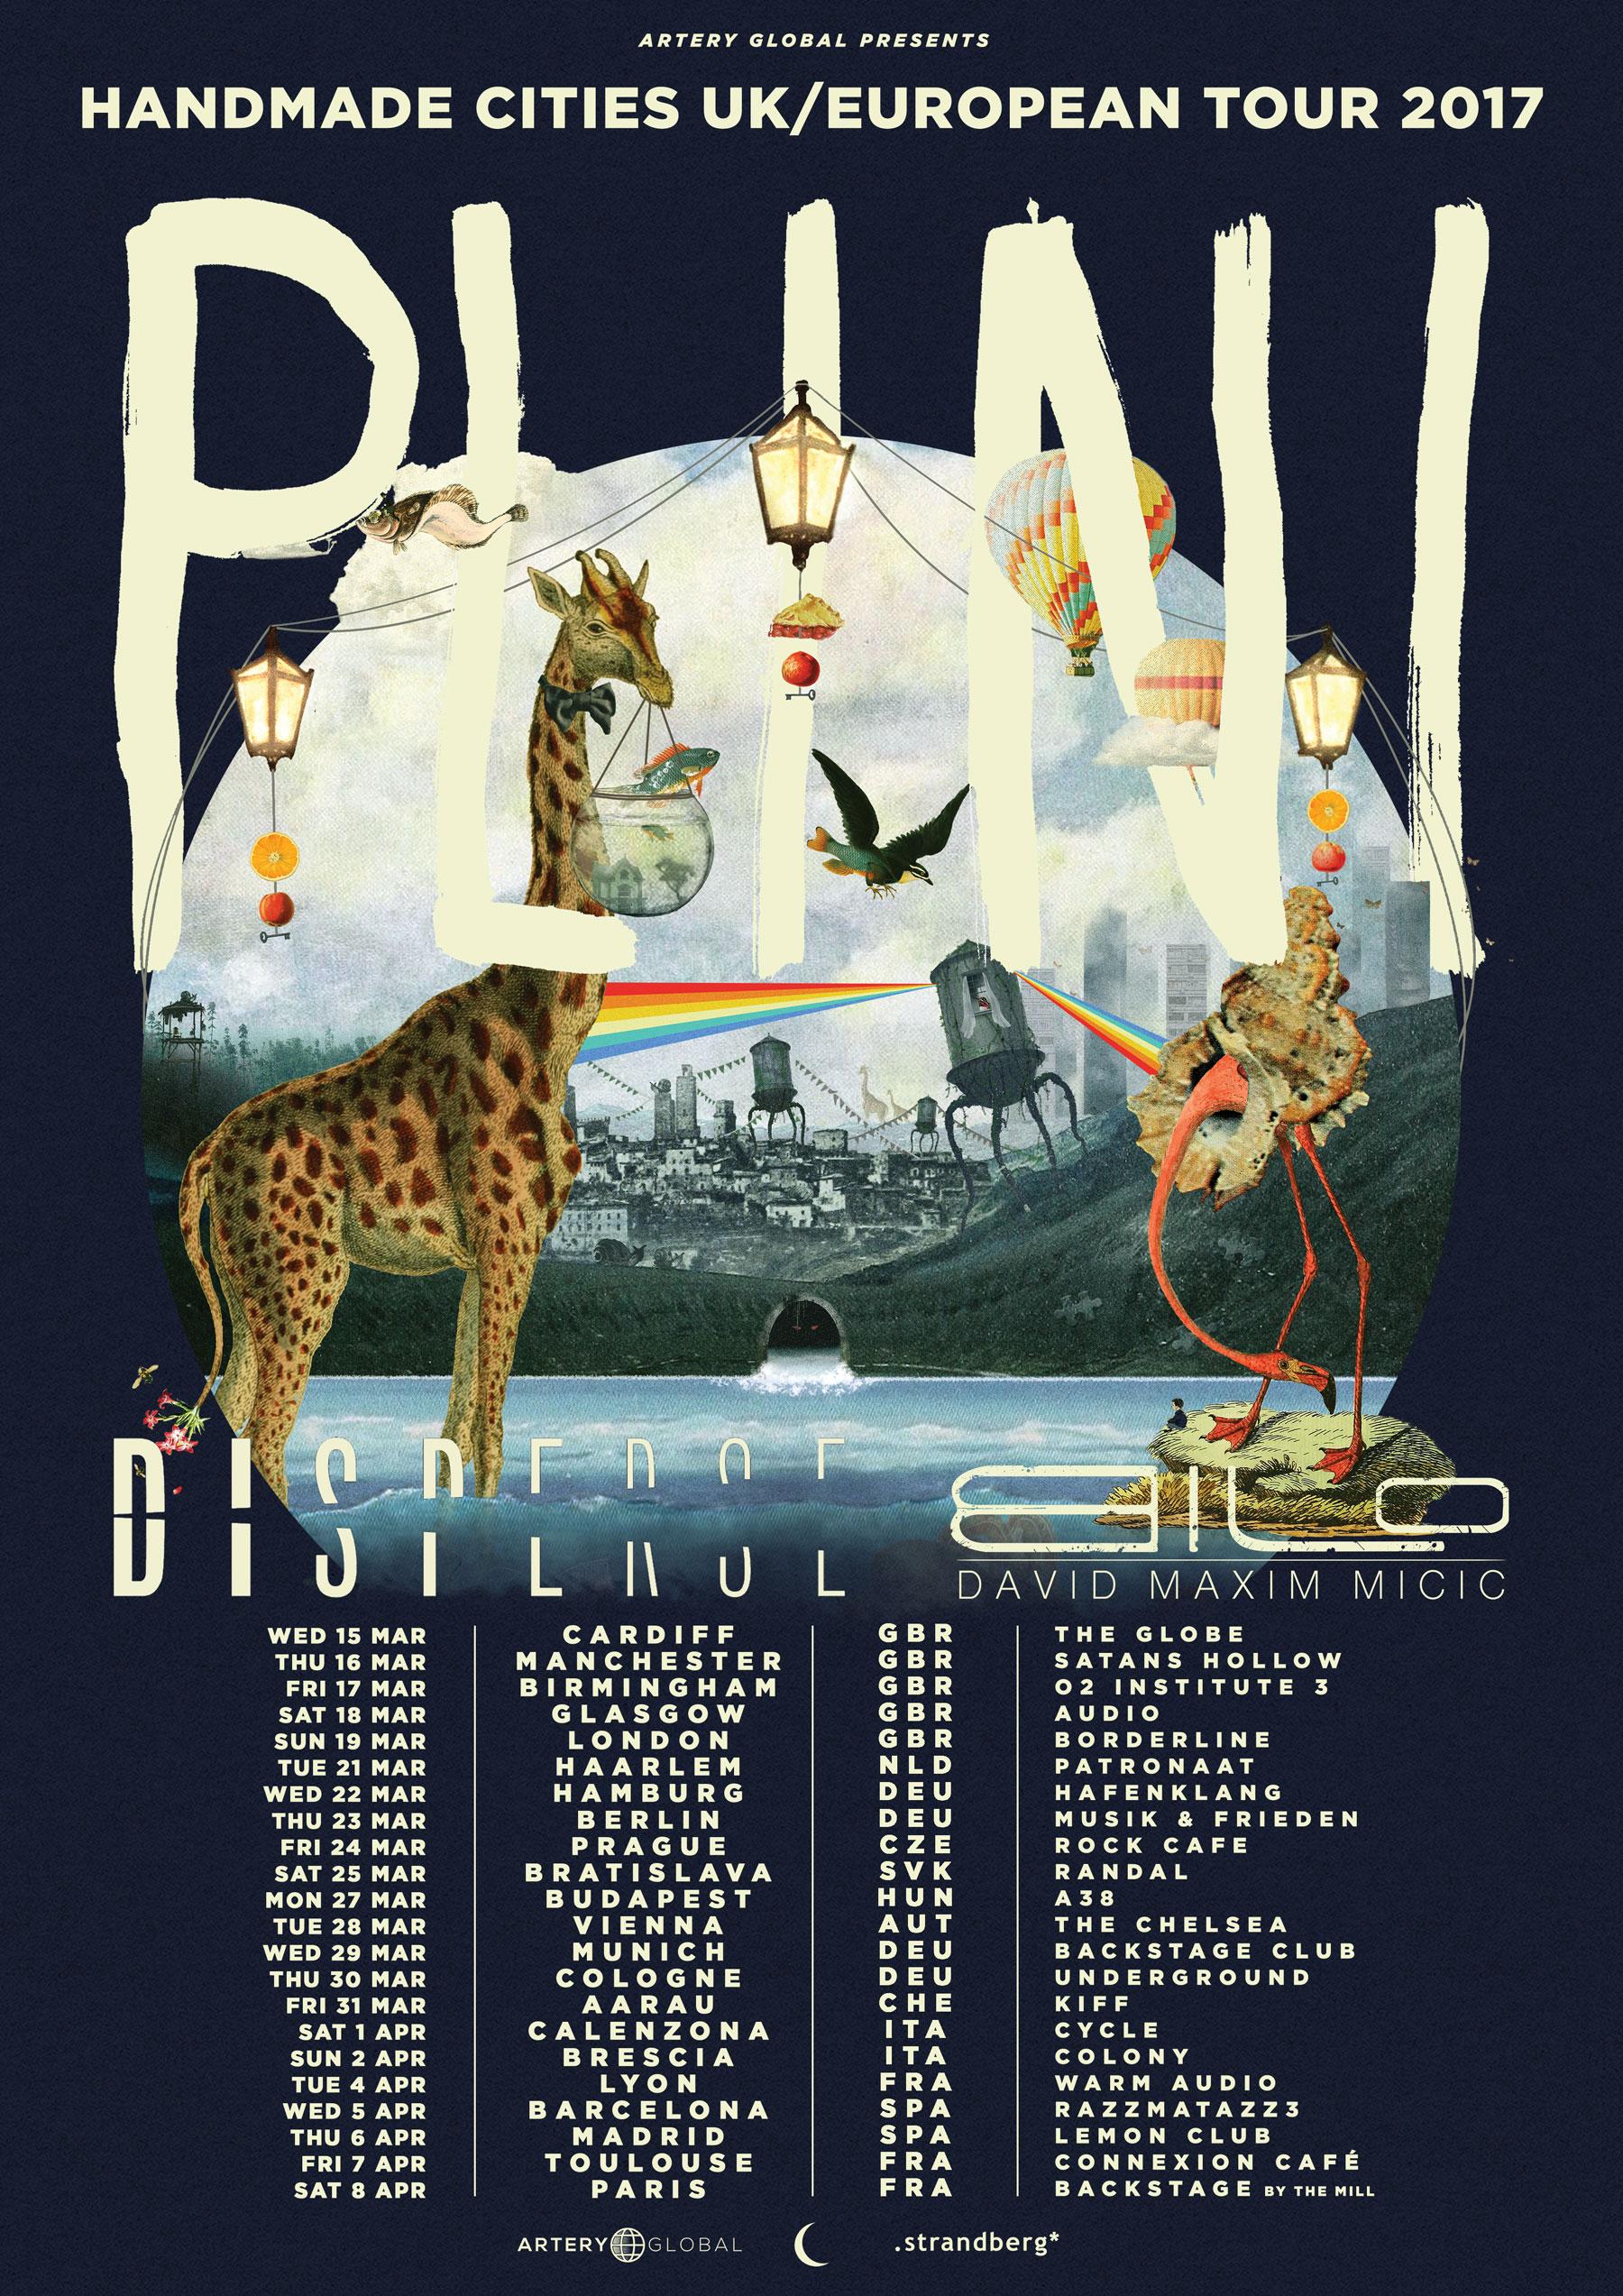 Plini (AUS) + Disperse (POL) + David Maxim Micic (SRB) - UK / Europe tour